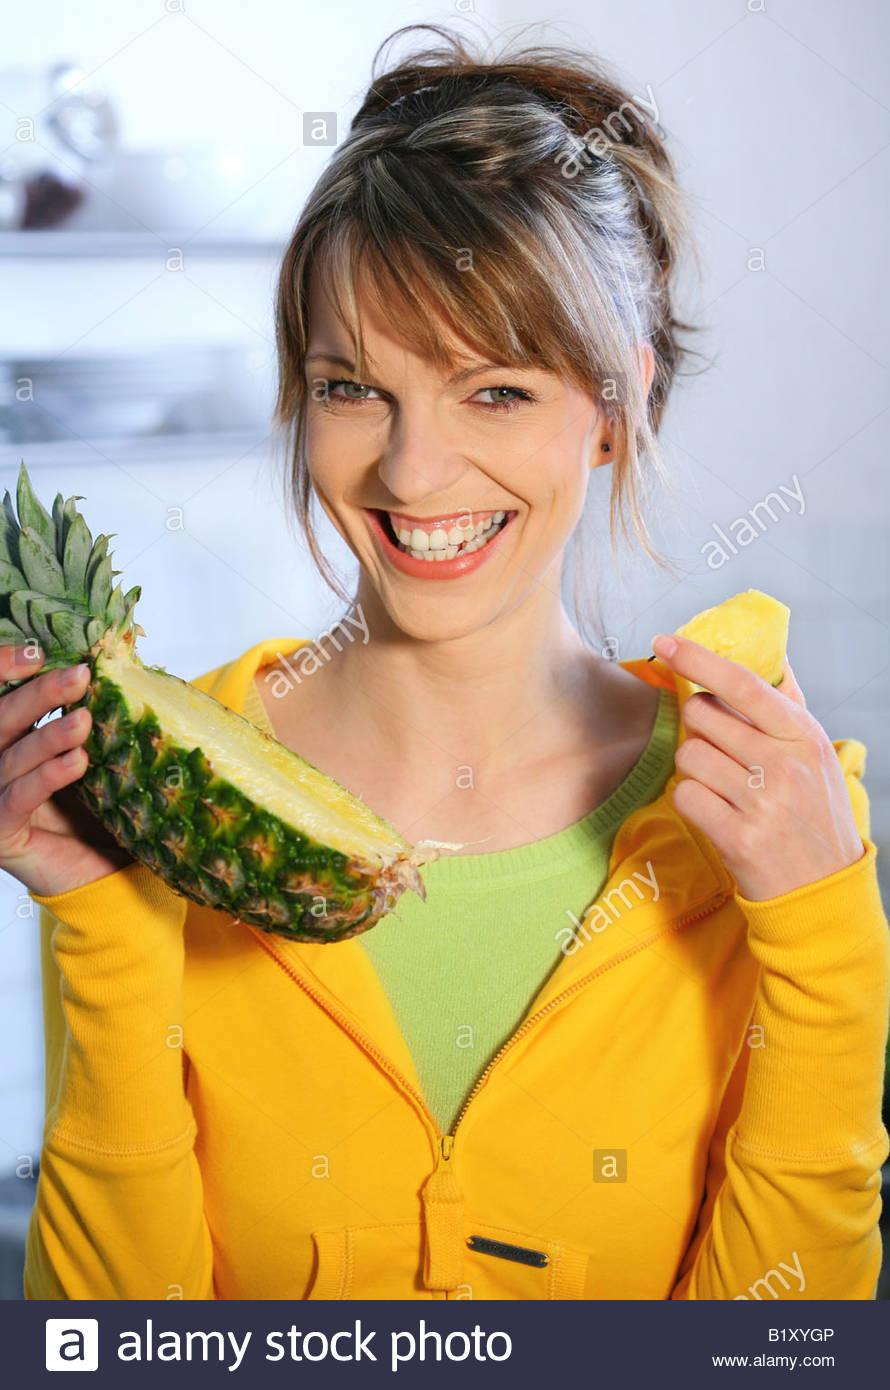 woman eating pineapple Stock Photo